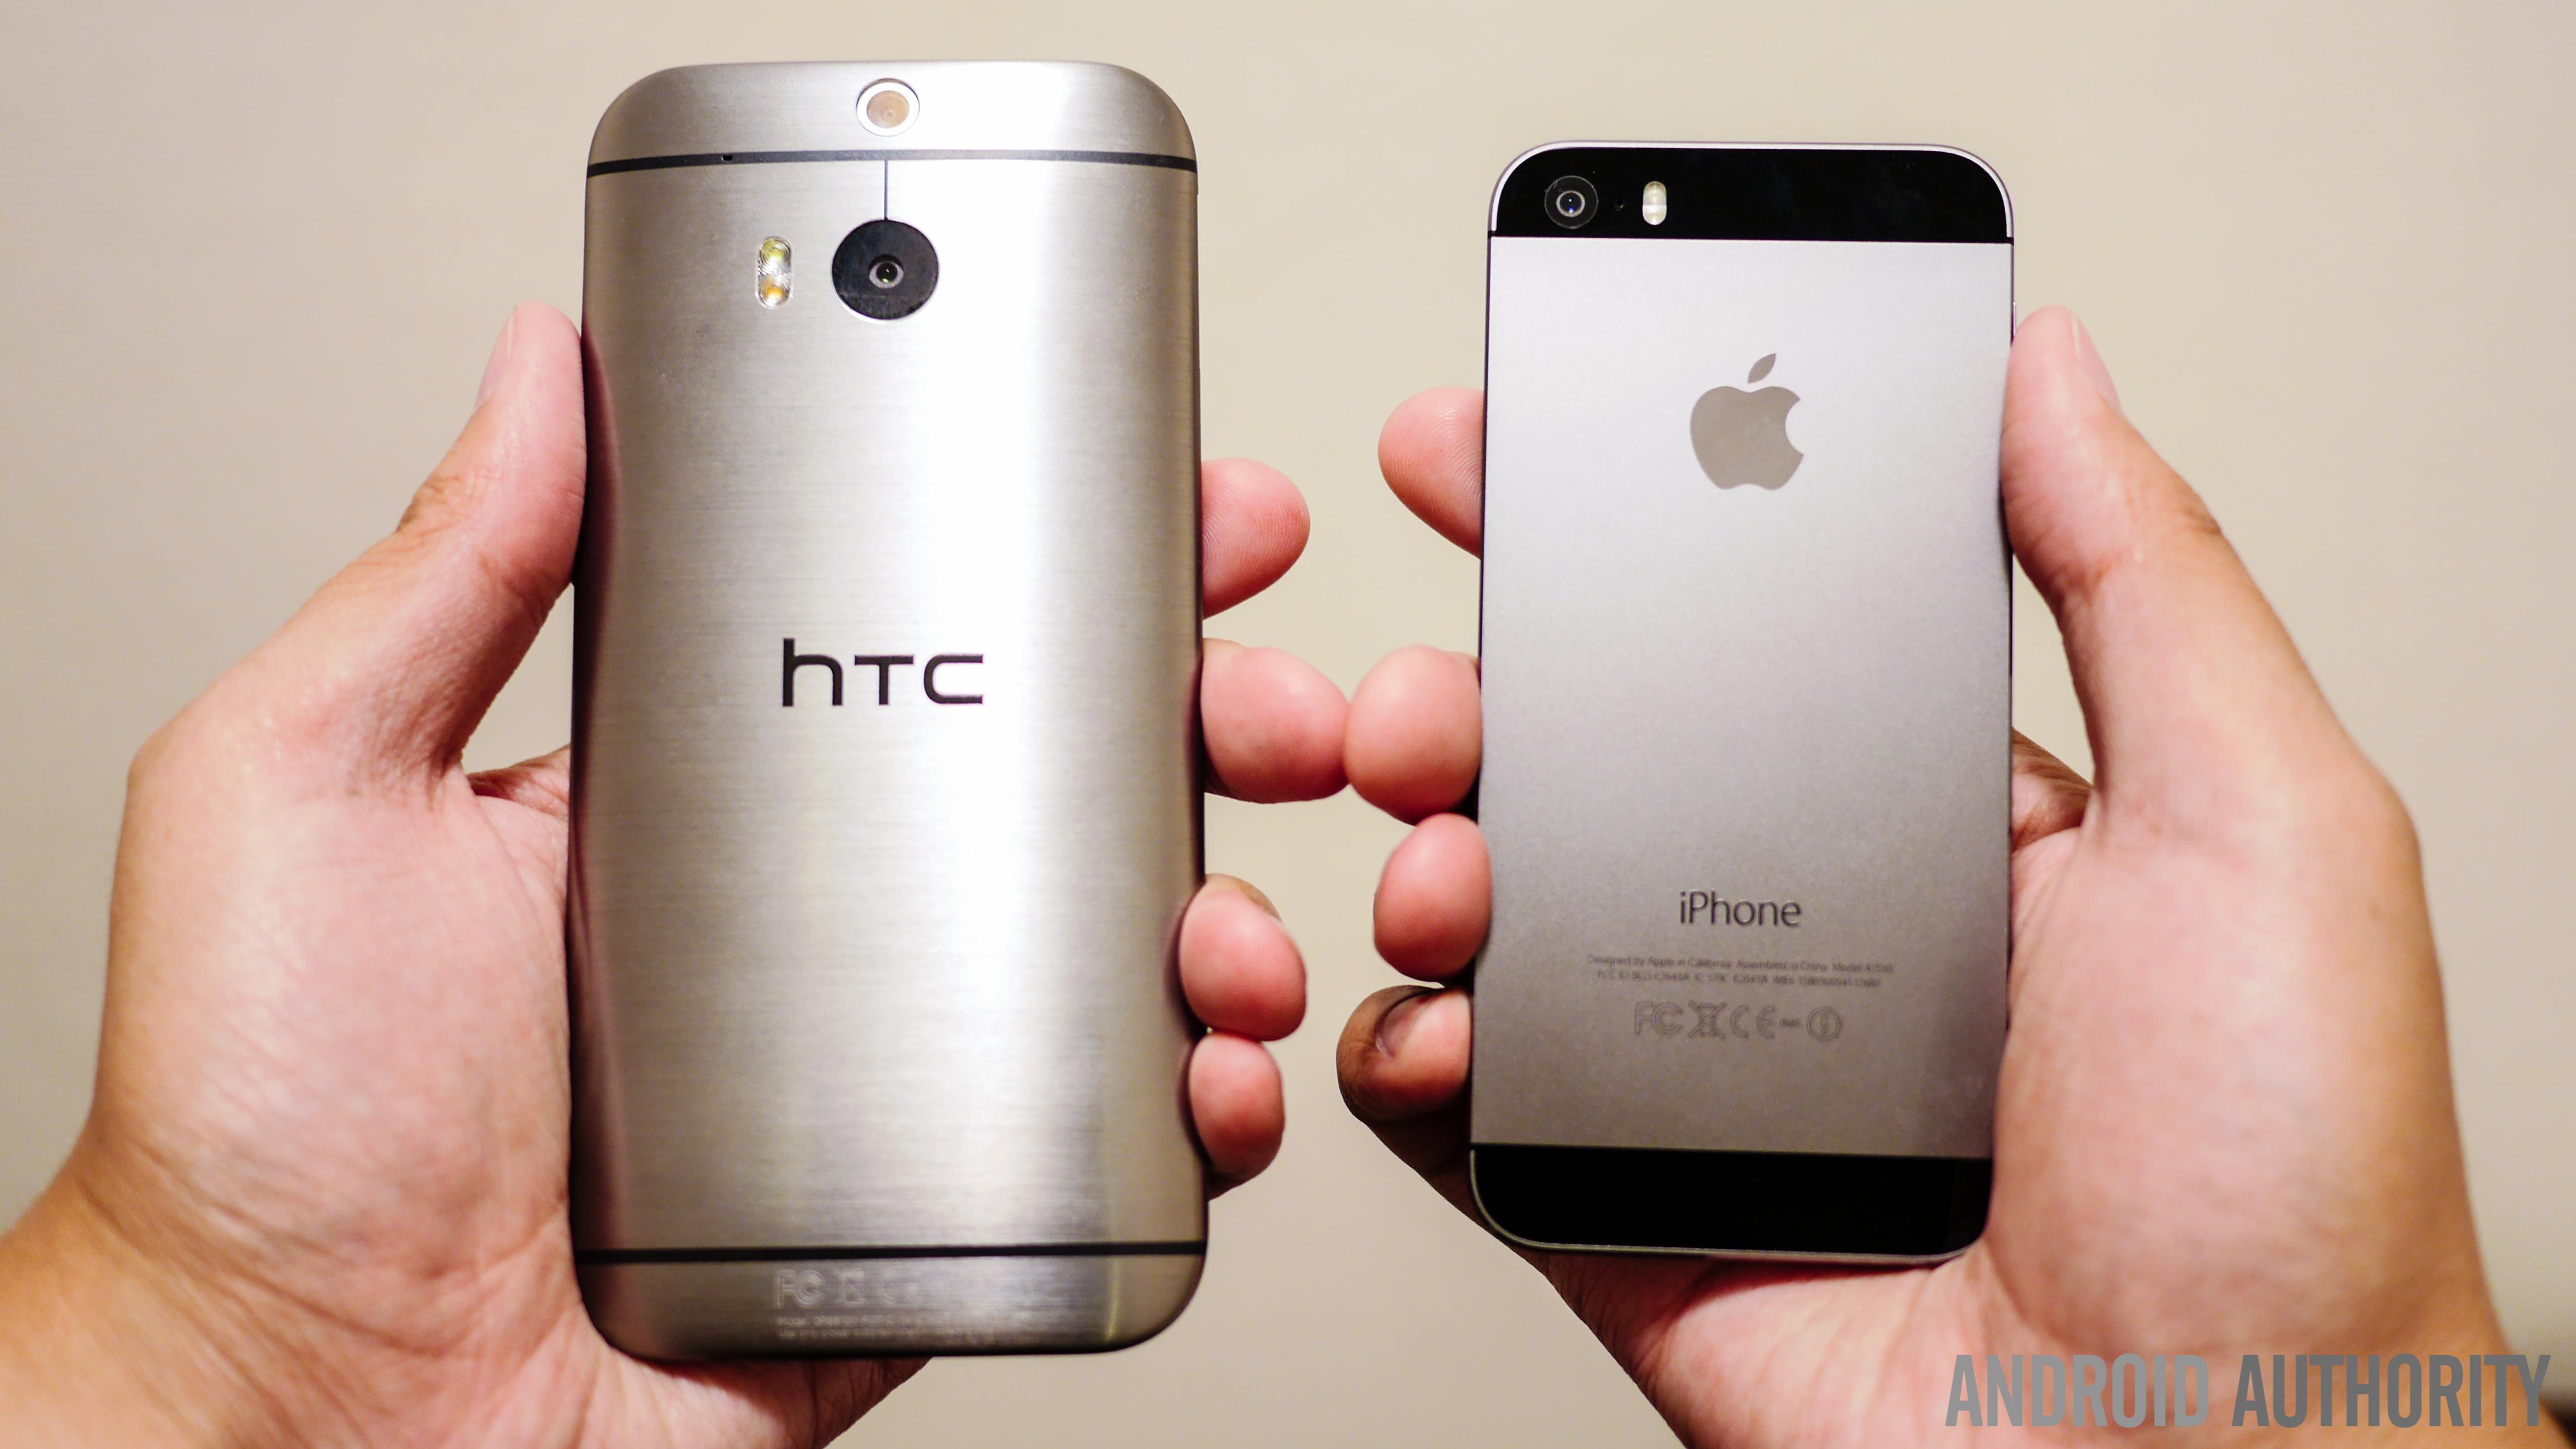 htc one m8 vs iphone 5s quick look aa handheld (2 of 6)